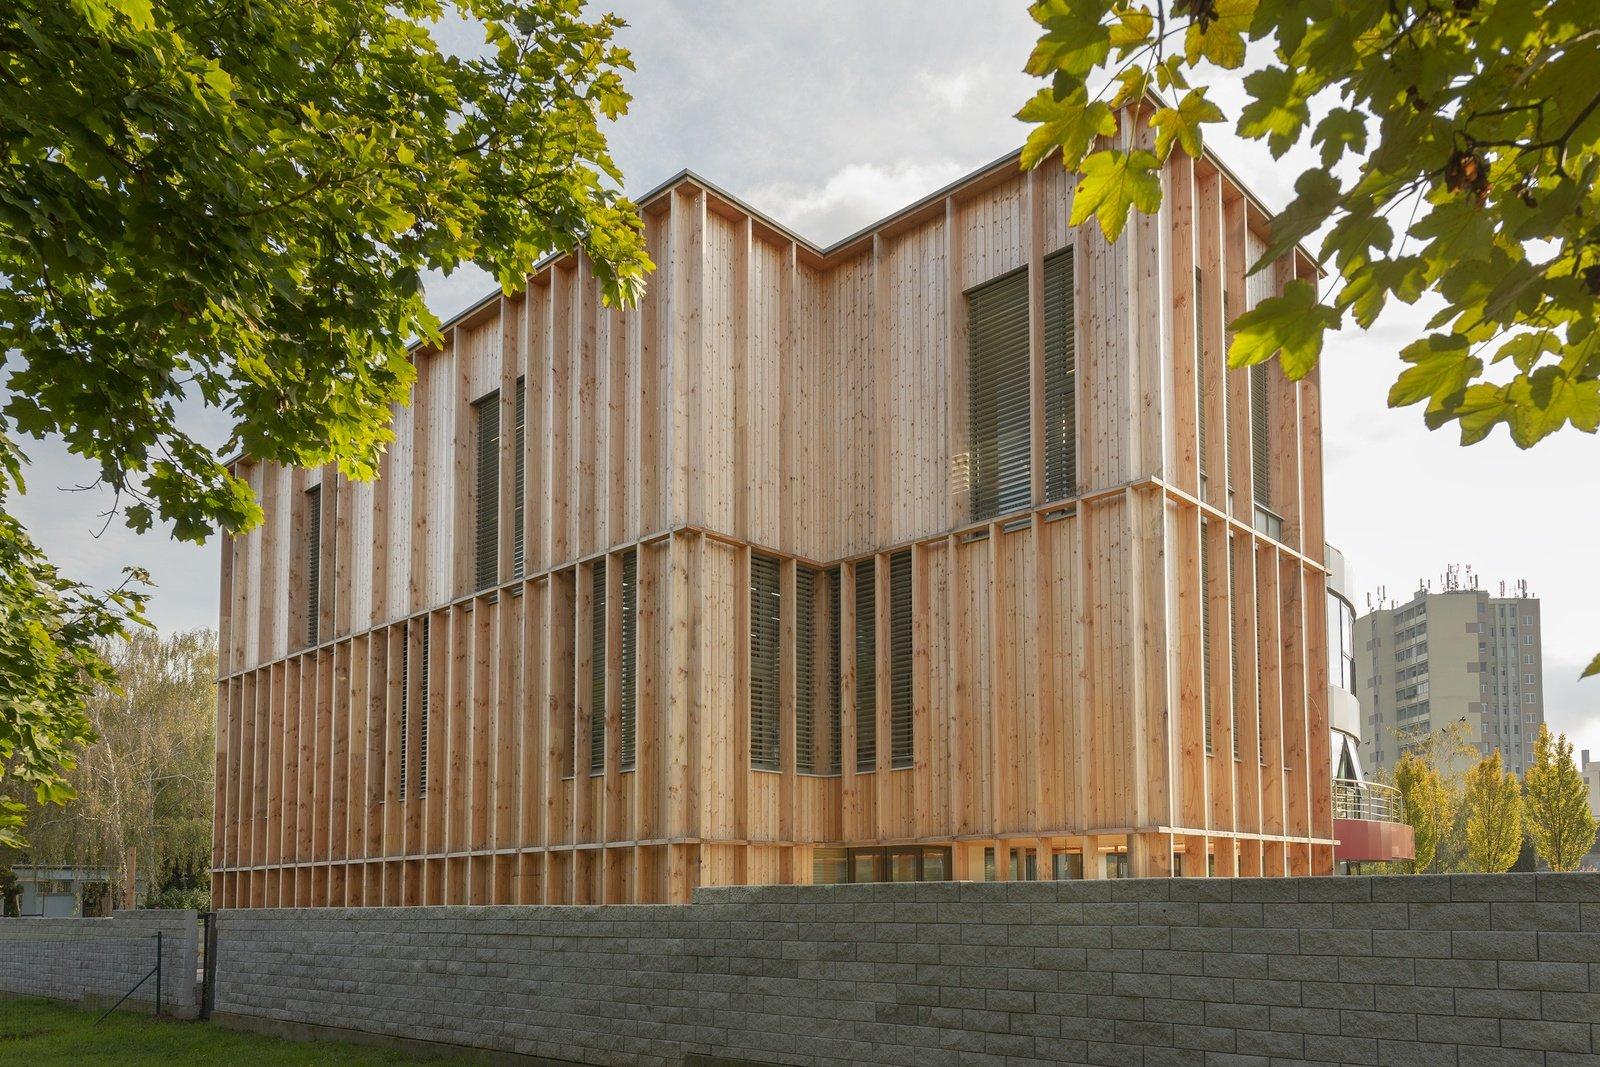 Kubis Architekti, dentálne cetrum, Hlohovec, architektúra, drevostavba, prístavba